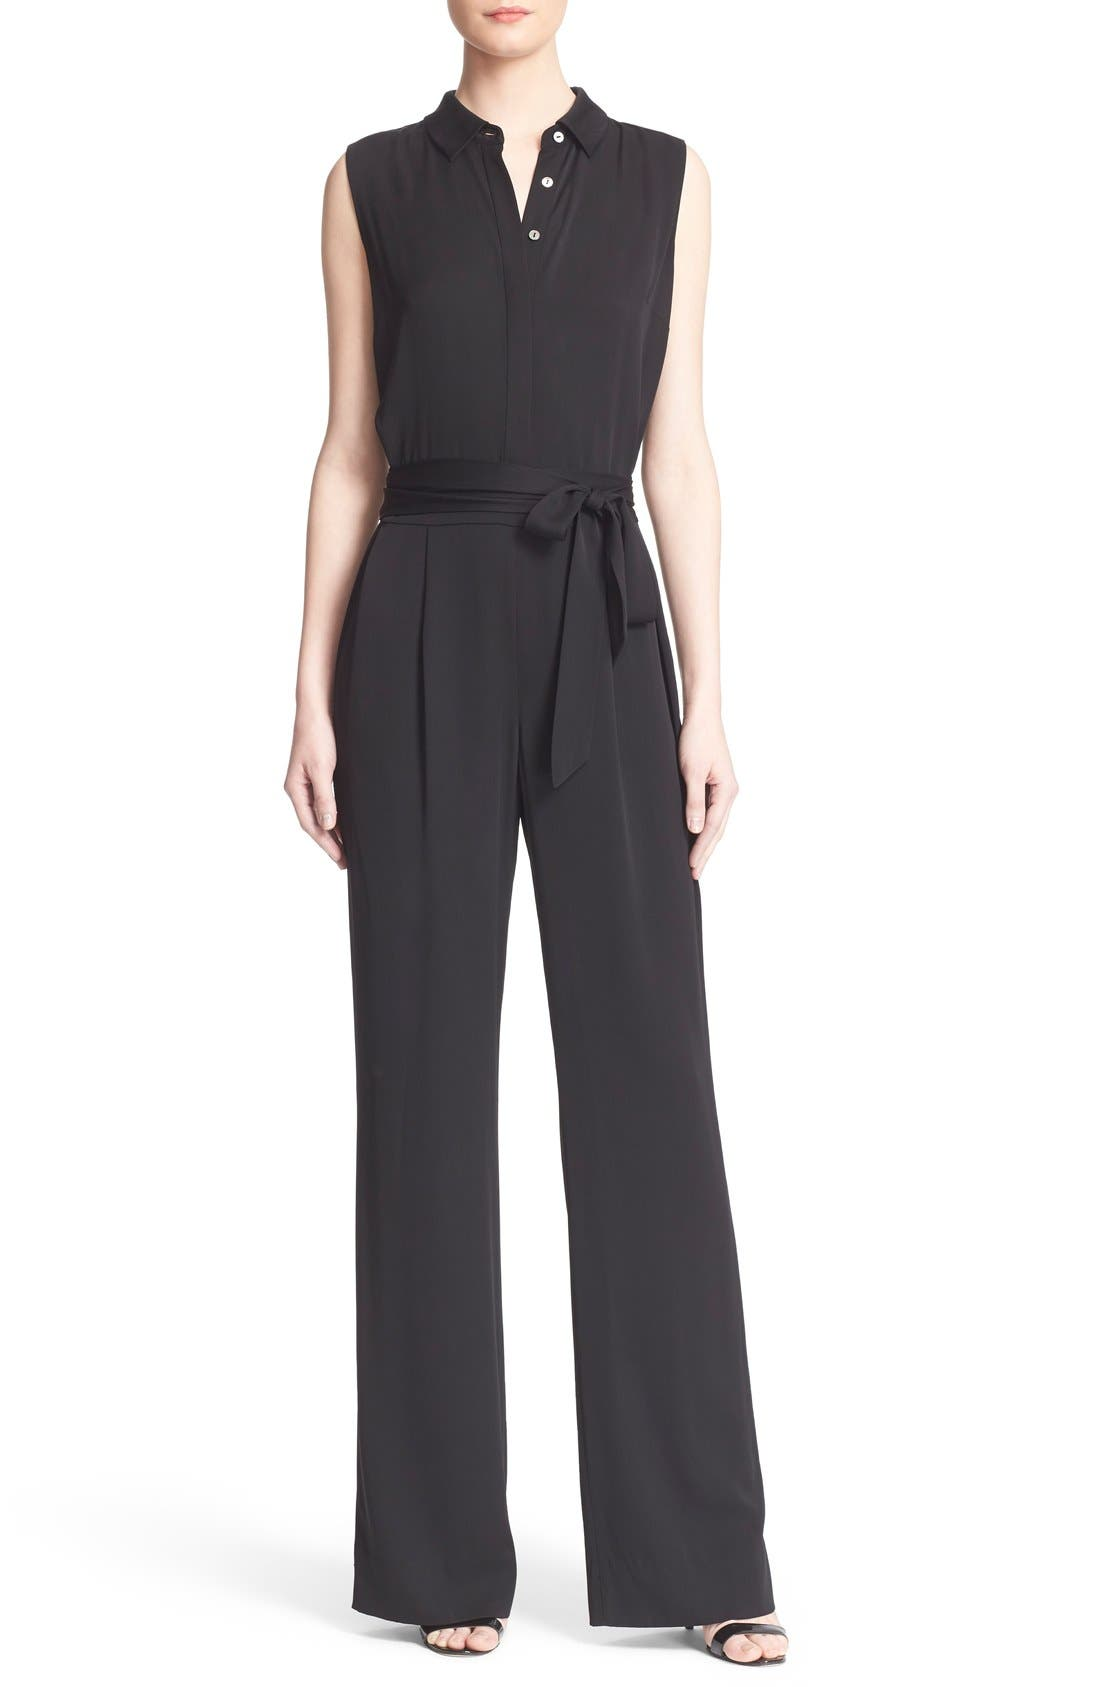 Alternate Image 1 Selected - Diane von Furstenberg 'Traci' Stretch Silk Sleeveless Jumpsuit